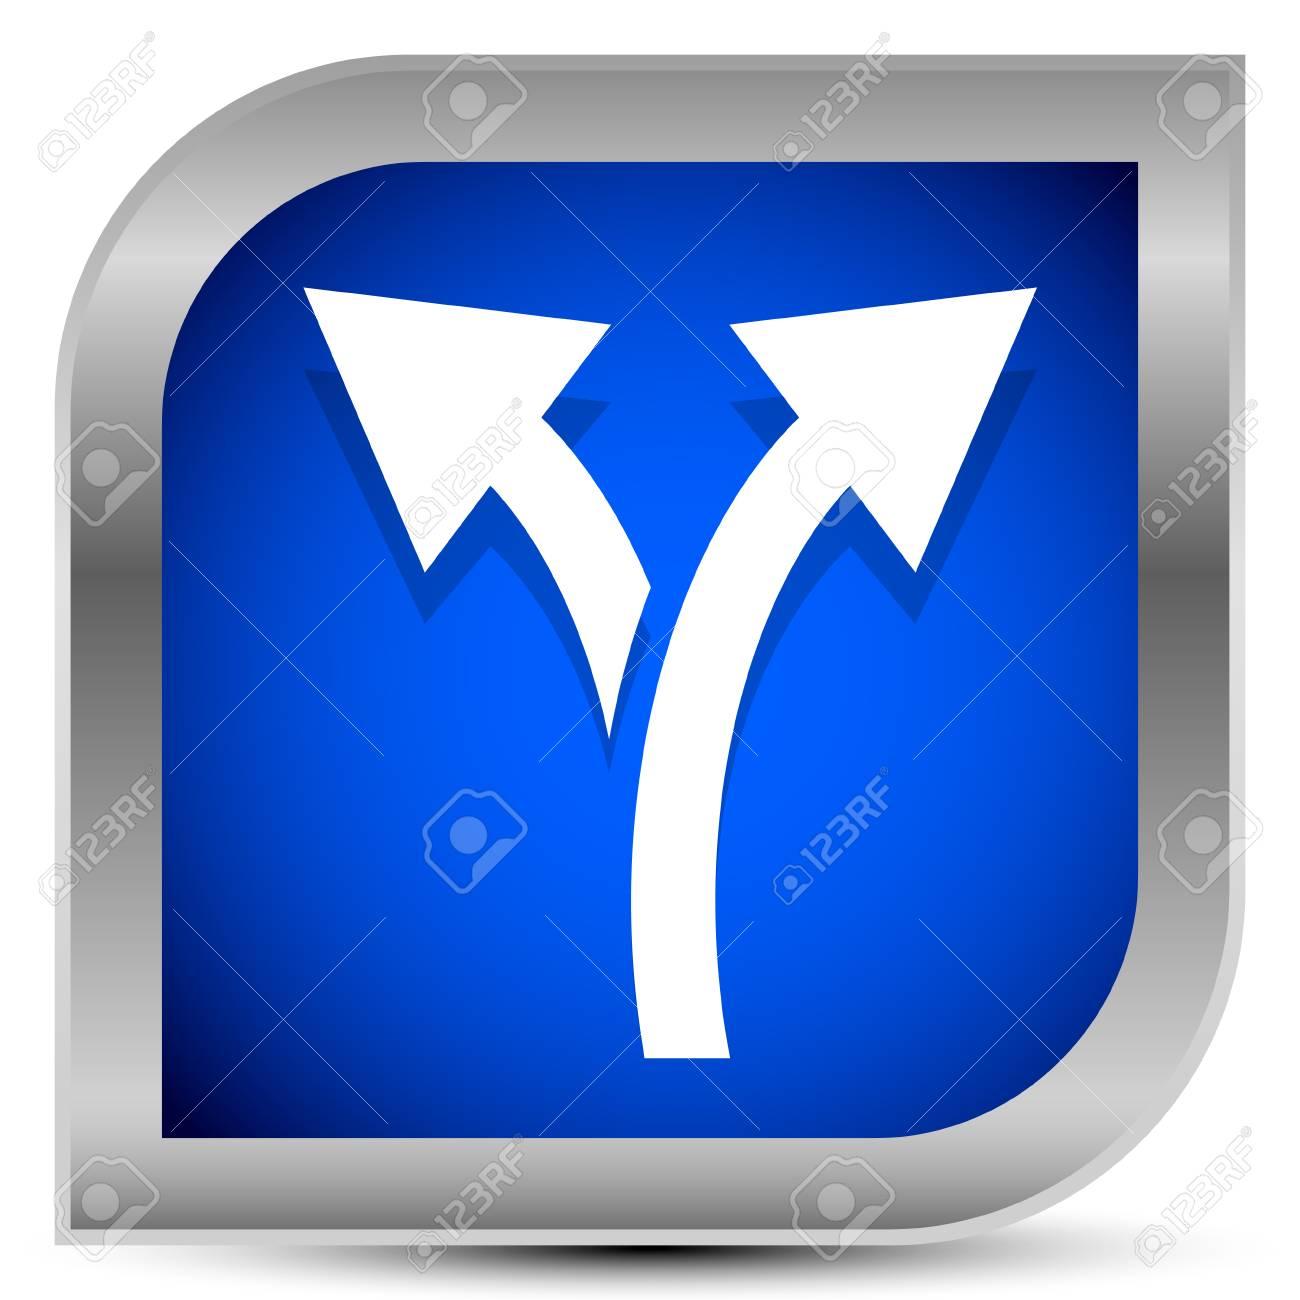 Icon with 2 way arrow. Branch, diversion icon - 118161482